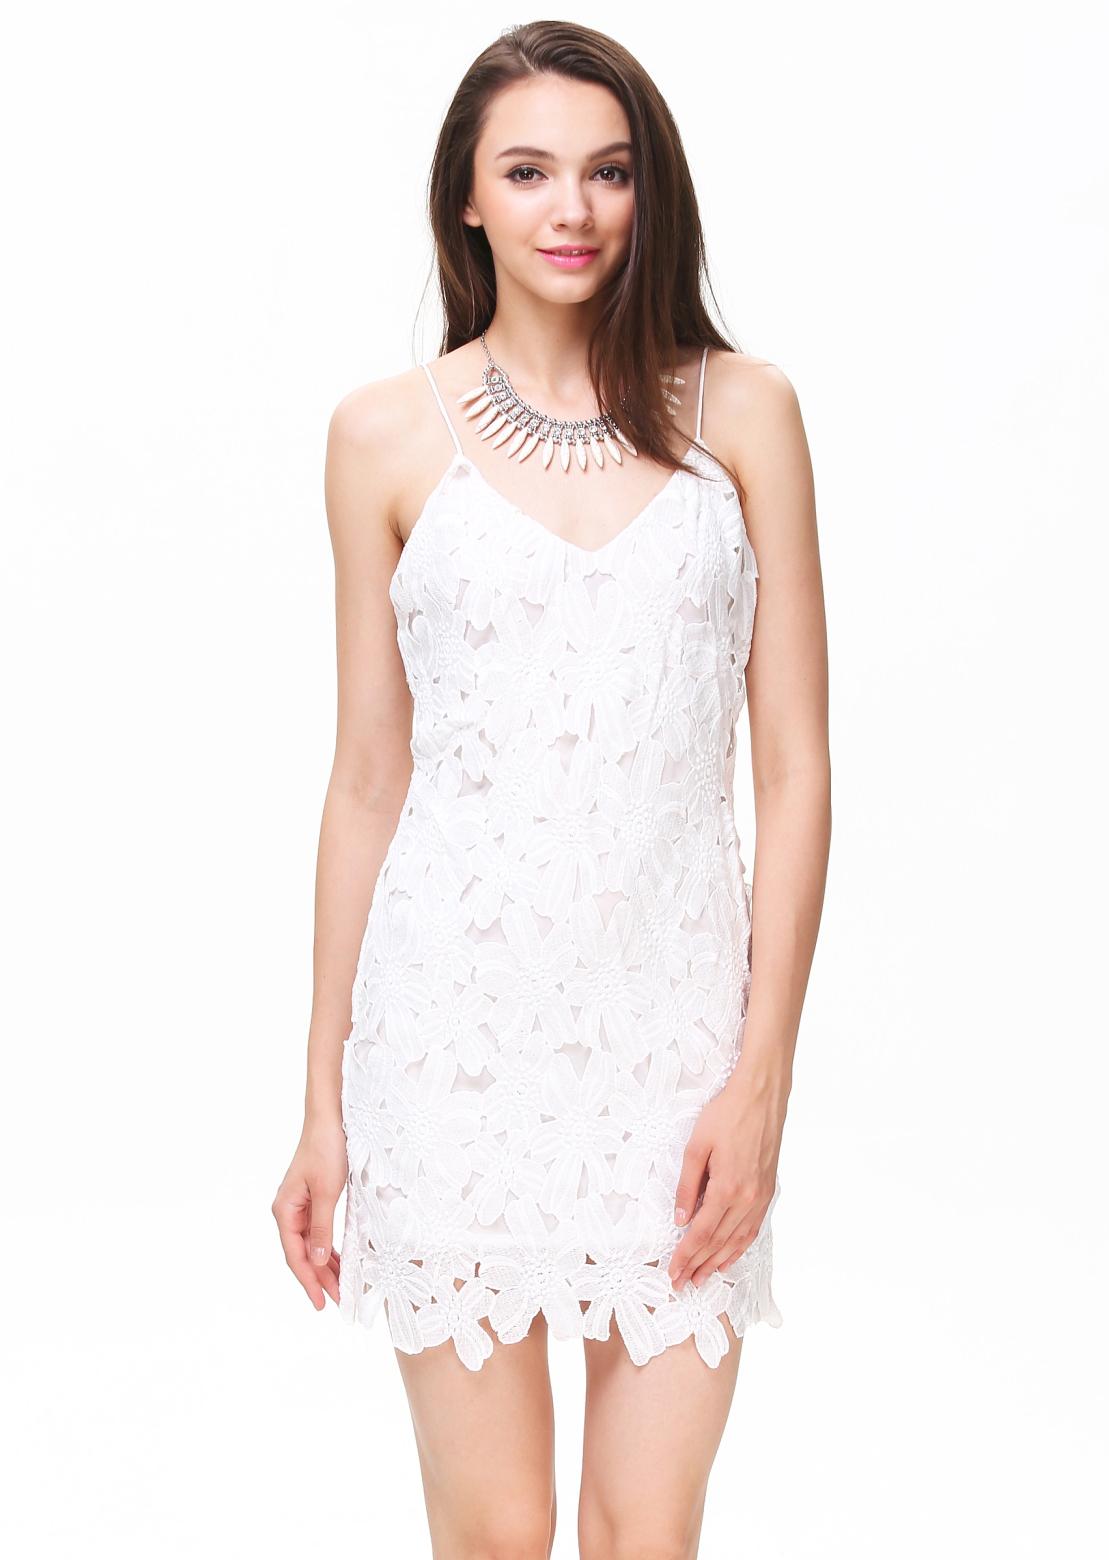 White Spaghetti Strap Deep V-back Crochet Dress - Sheinside.com